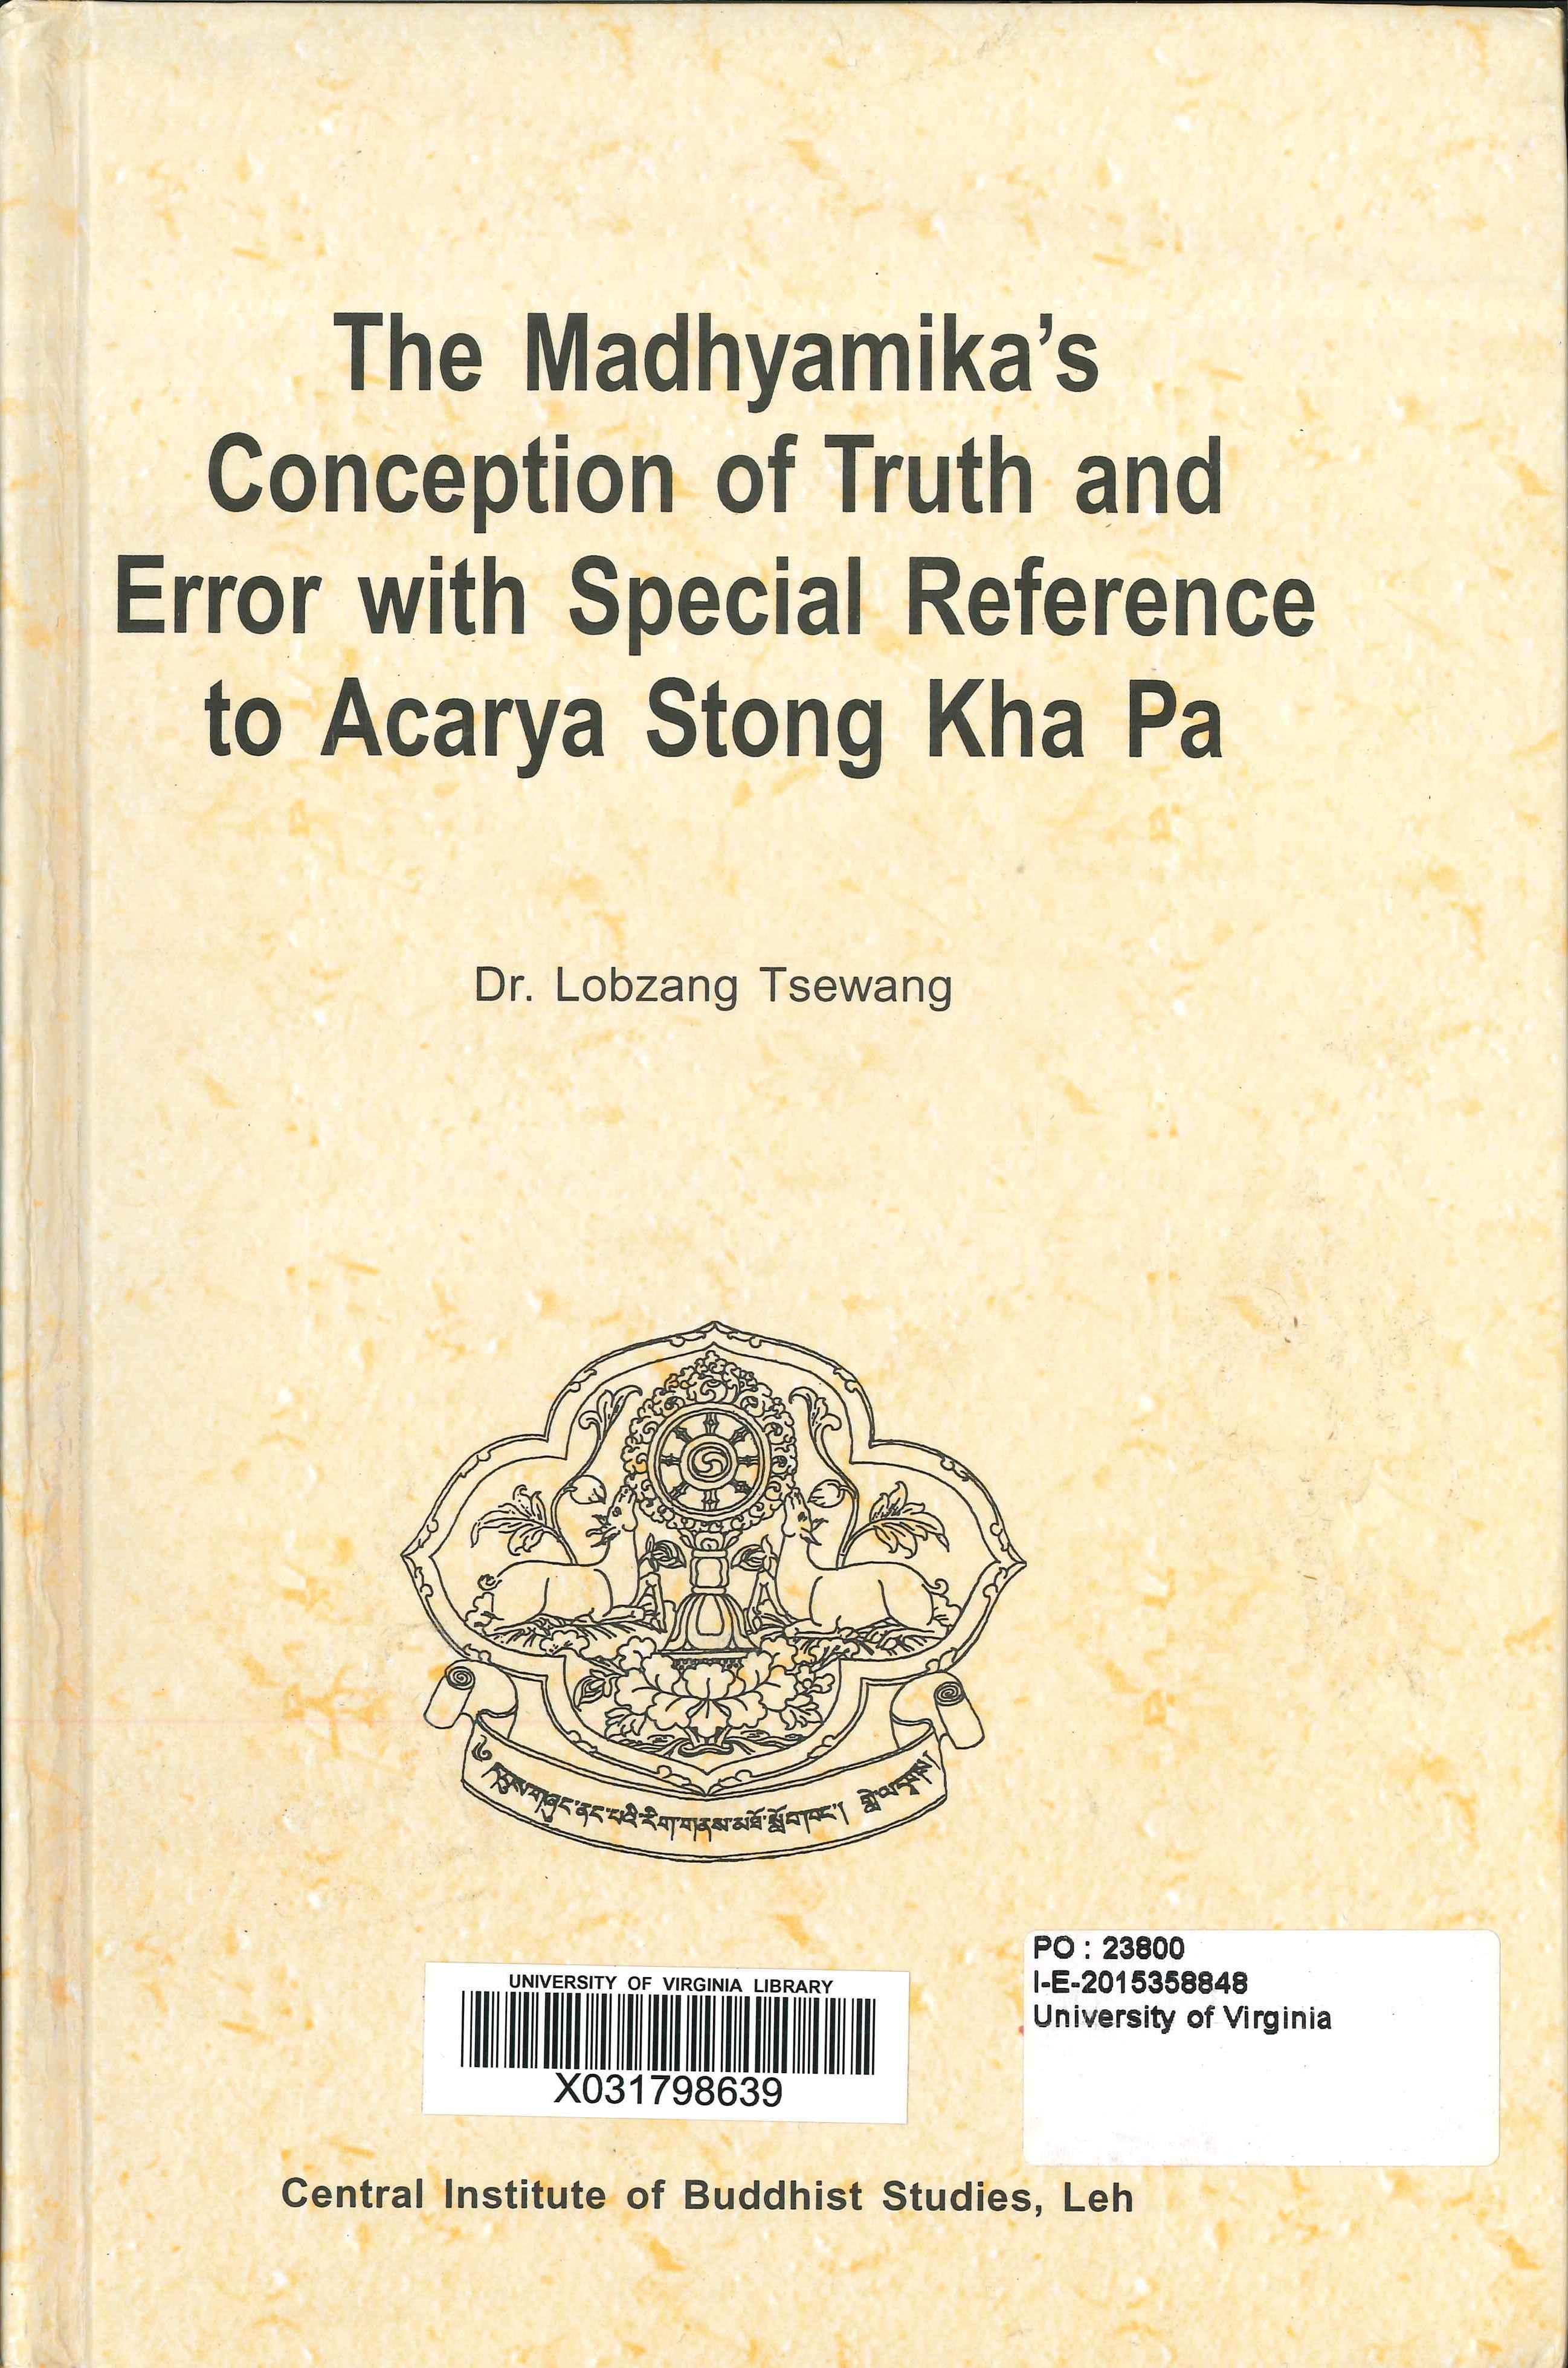 The Madhyamika